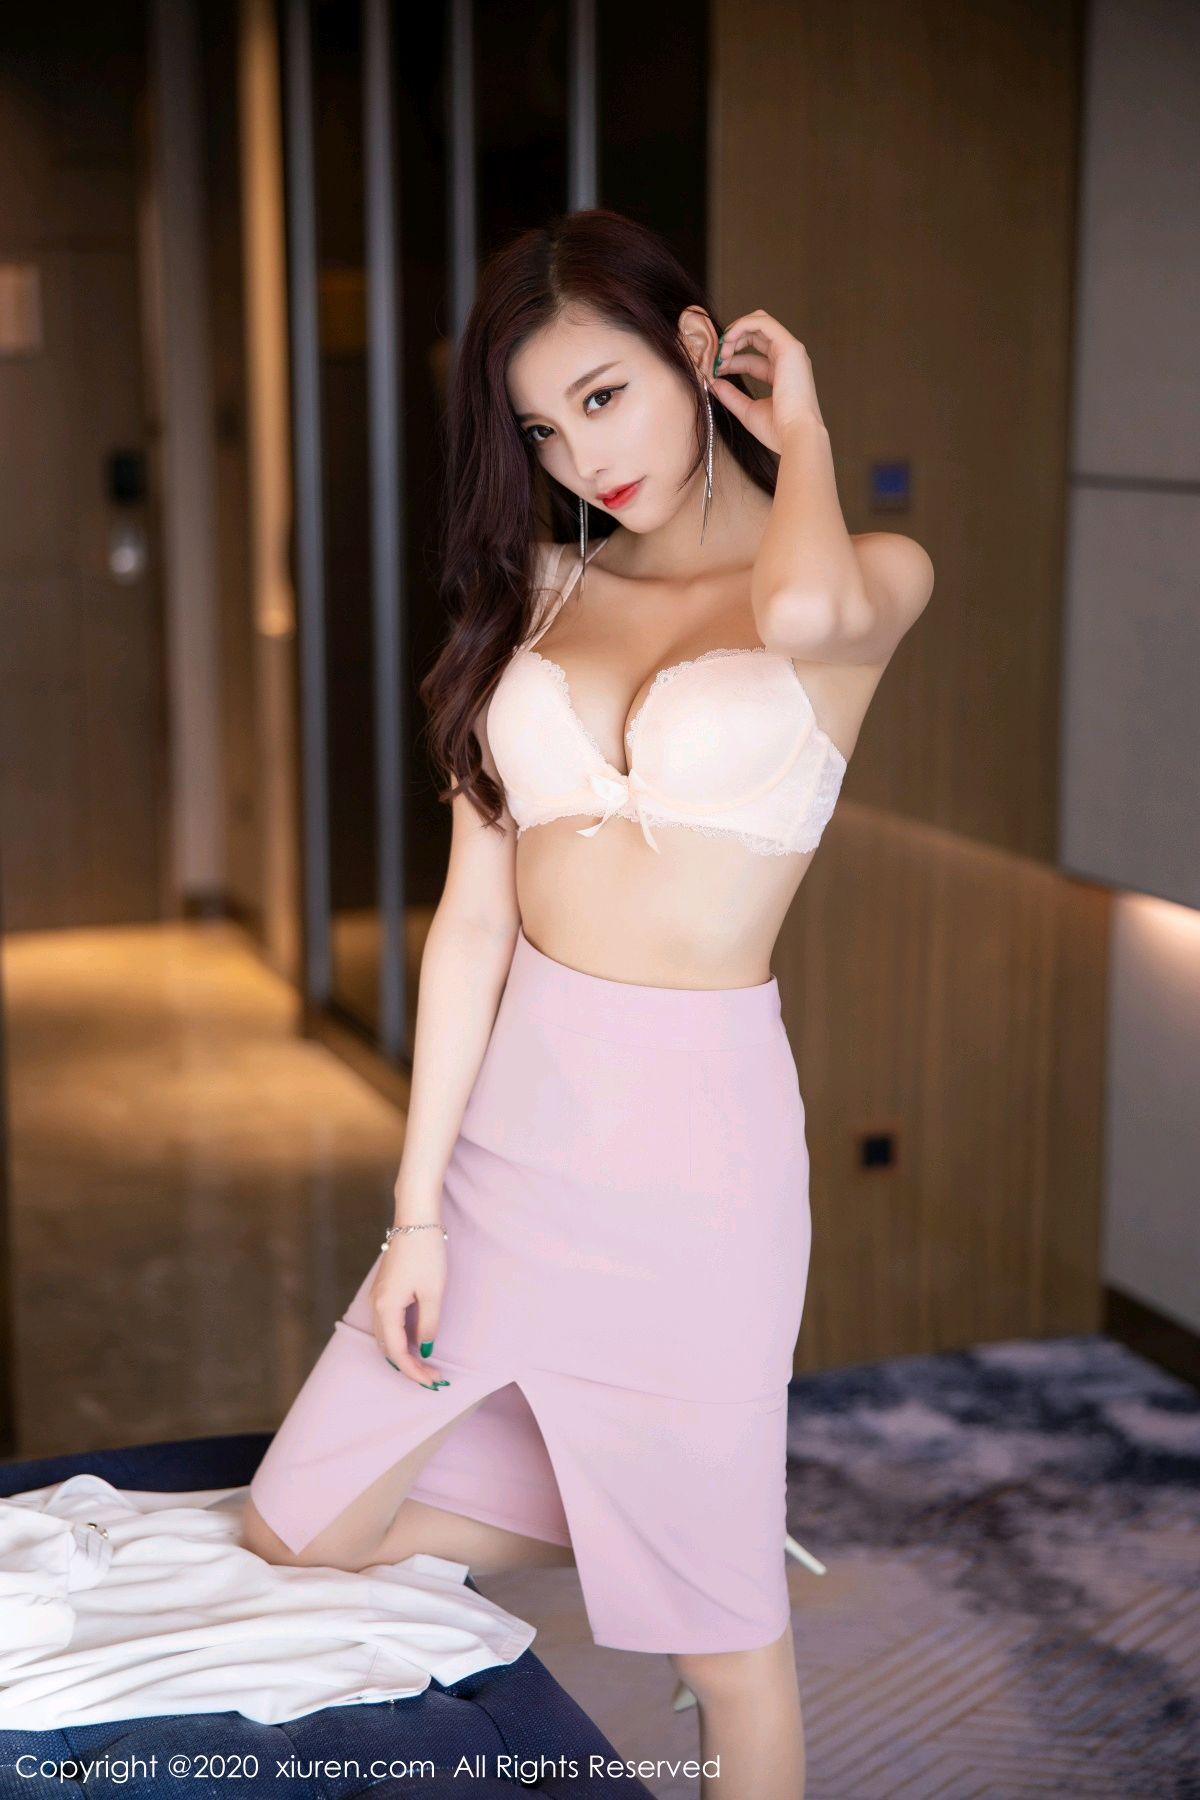 [XiuRen] Vol.2431 Yang Chen Chen 57P, Tall, Underwear, Uniform, Xiuren, Yang Chen Chen